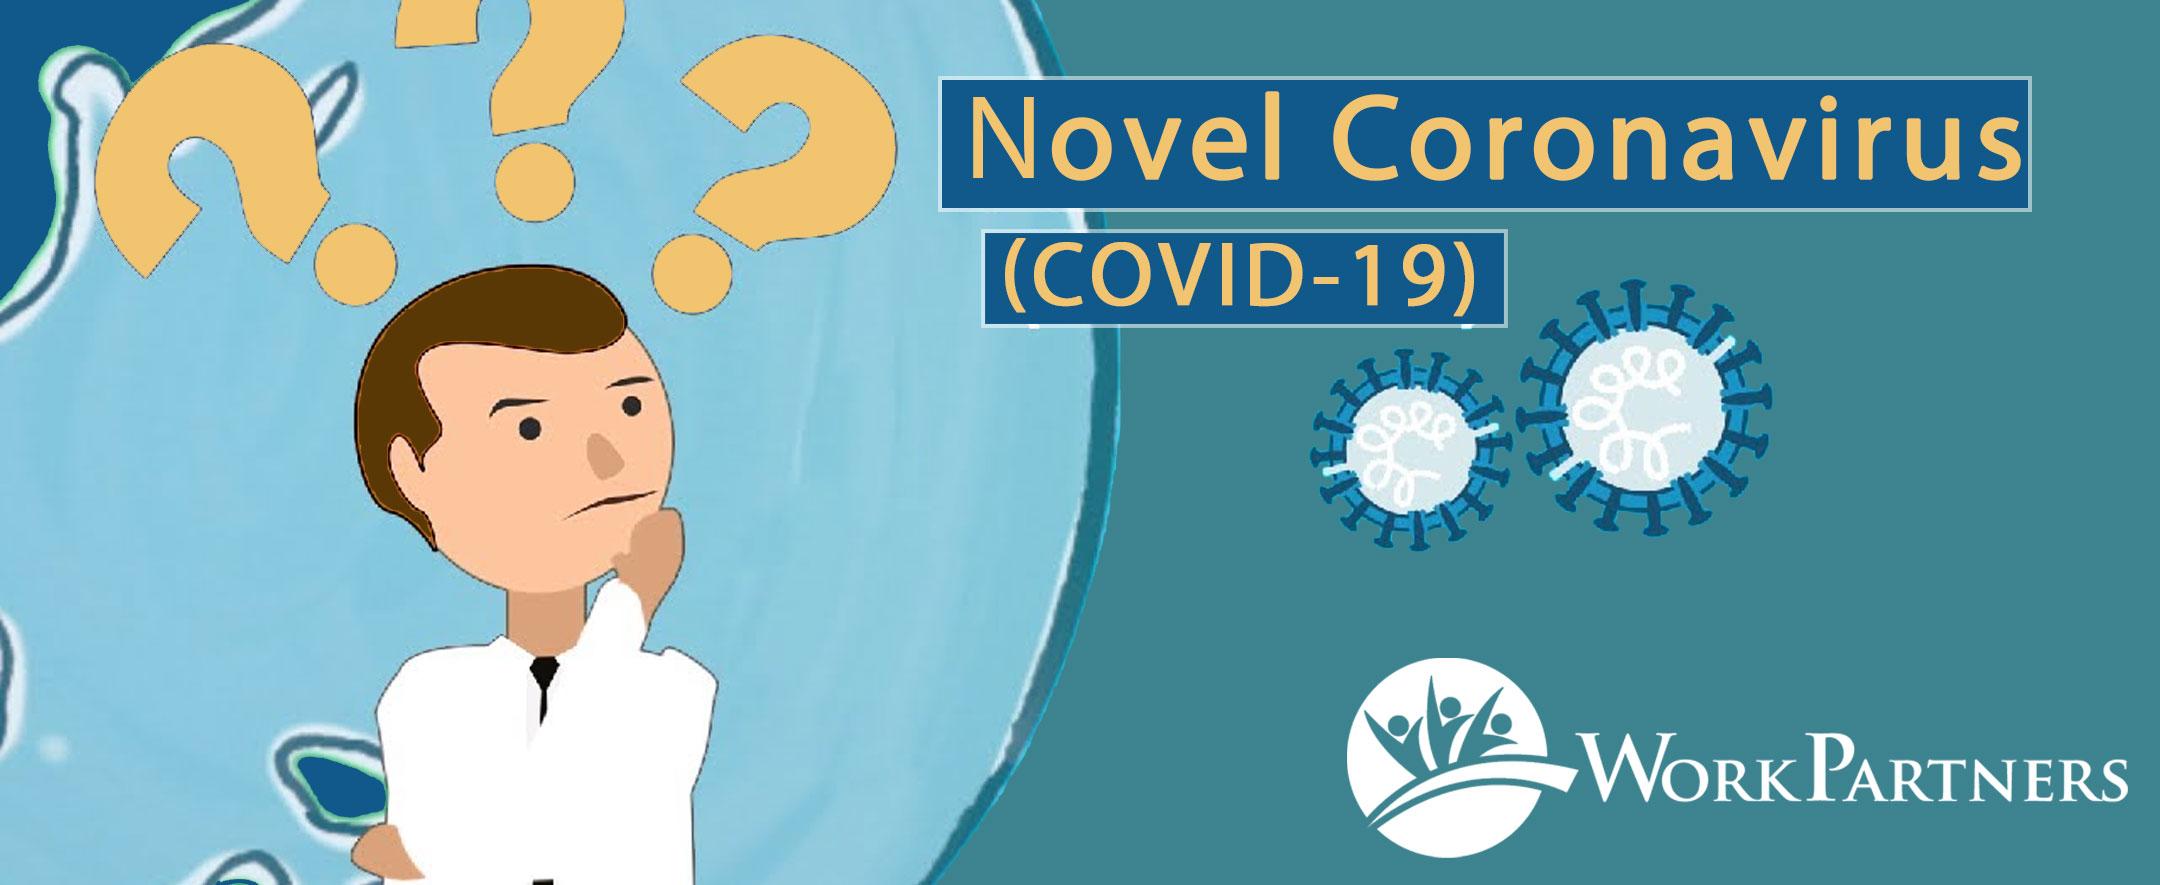 Novel Corona Virus header